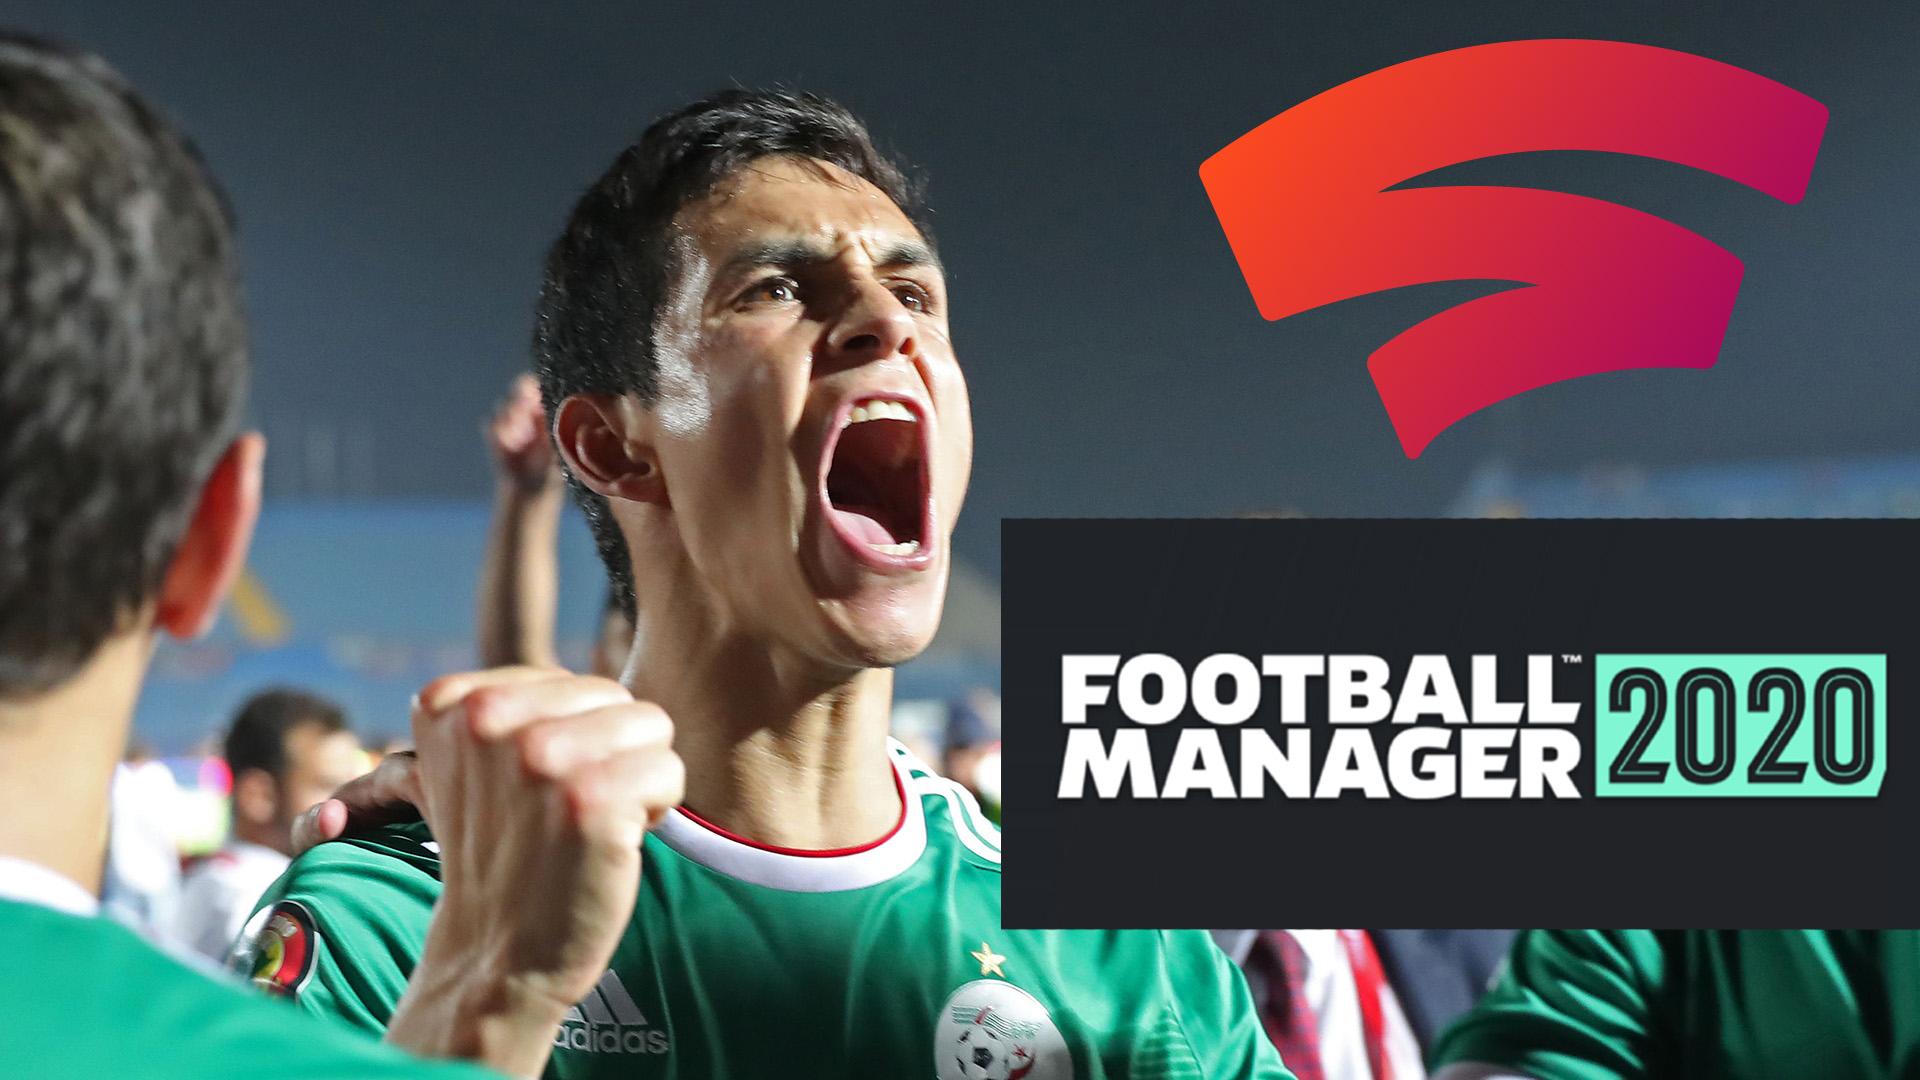 Niente Juventus anche su Football Manager: si chiamerà Zebre